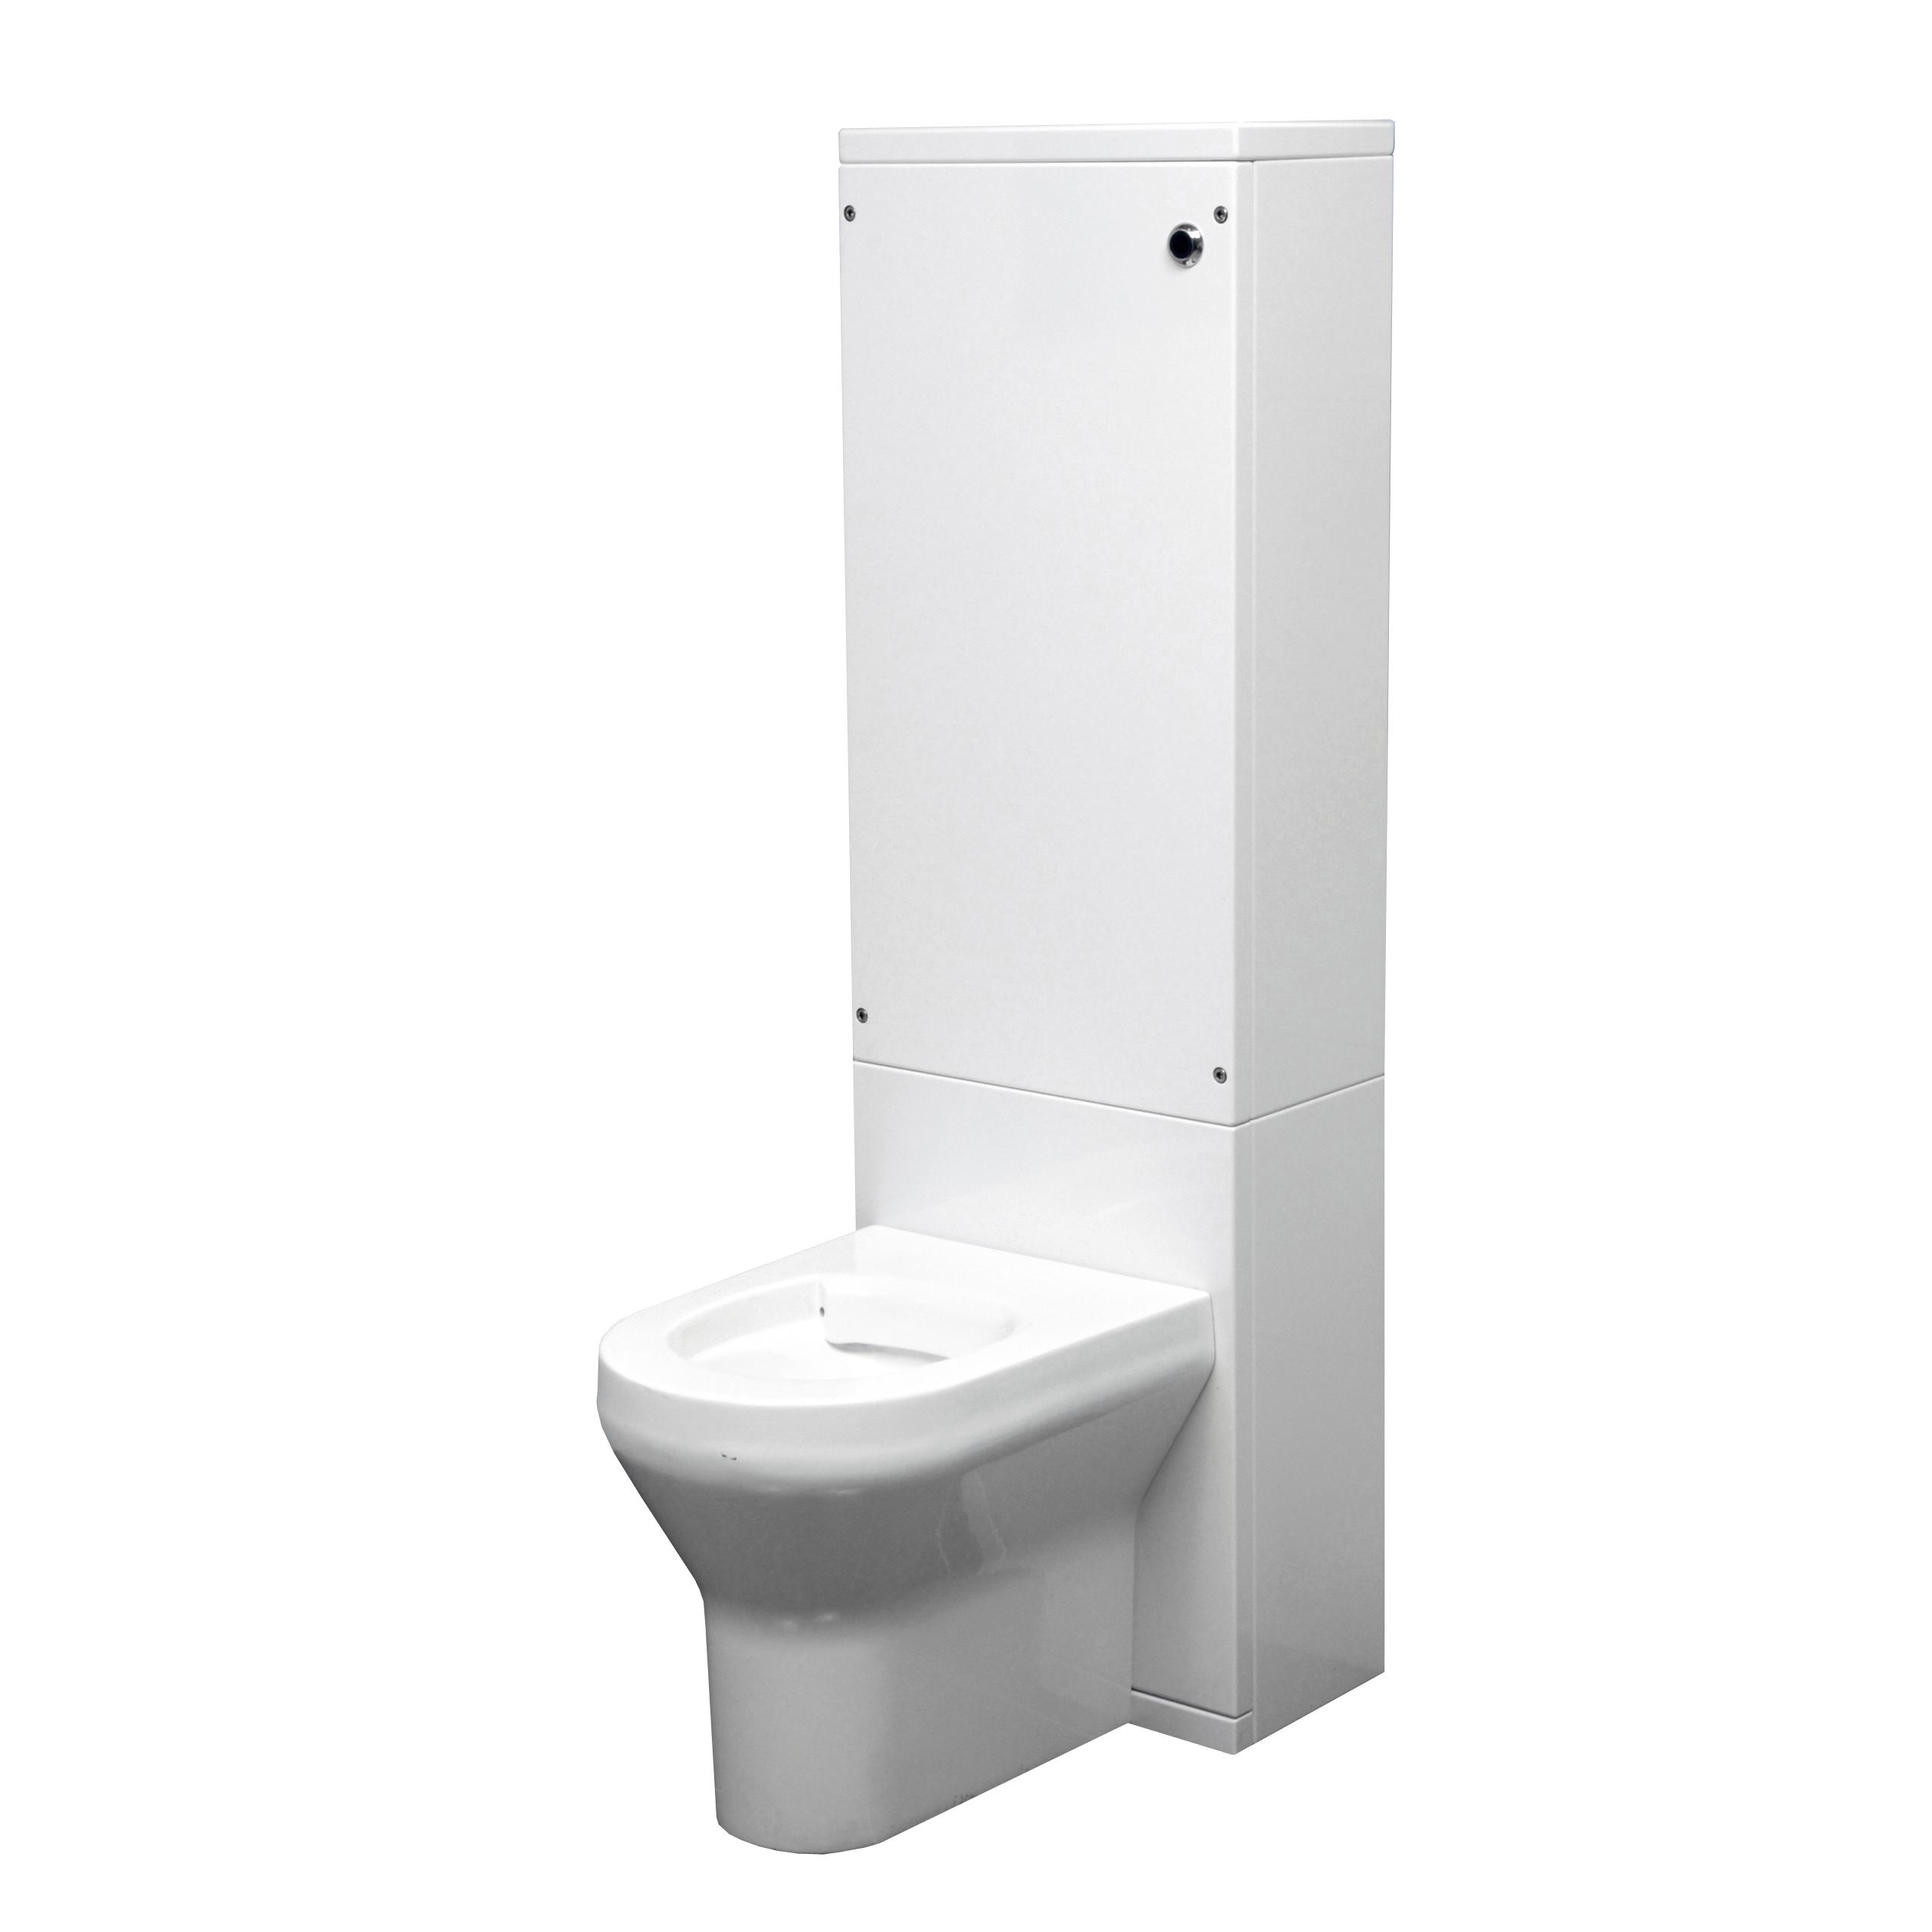 Heno WC modul (Golv-Plan)